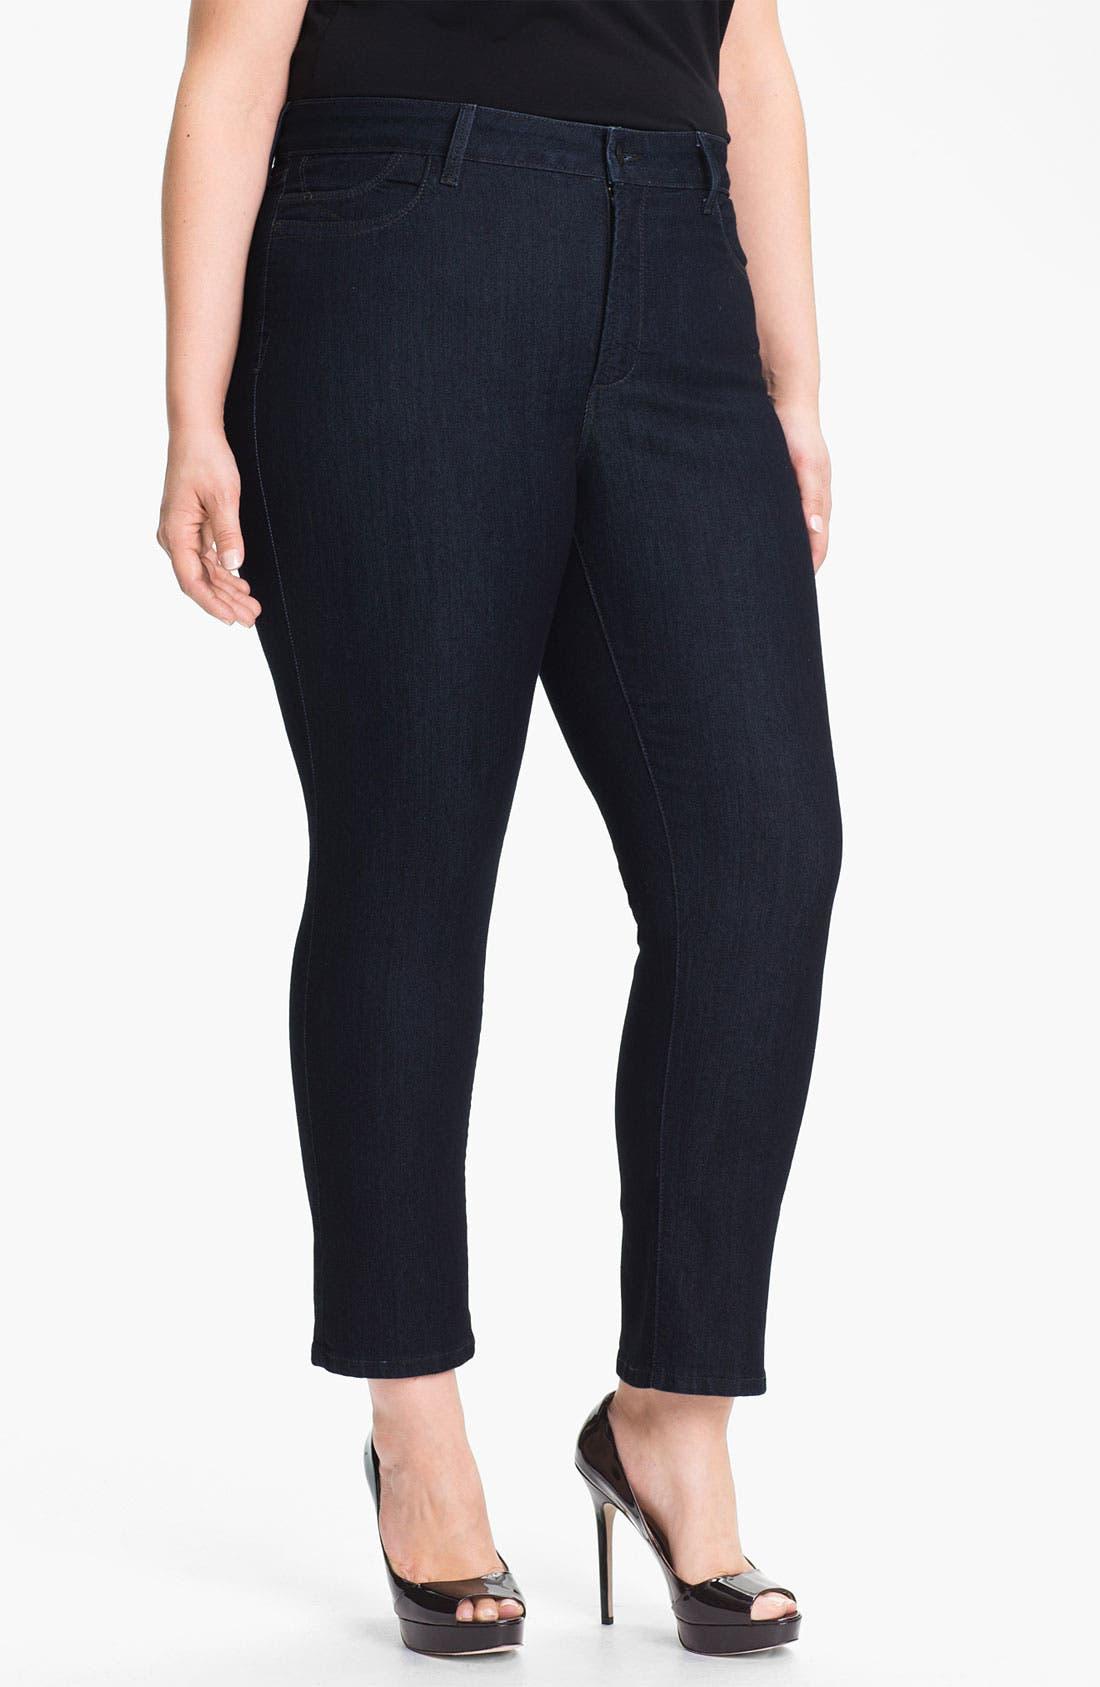 Main Image - NYDJ 'Audrey' Stretch Ankle Skinny Jeans (Plus Size)